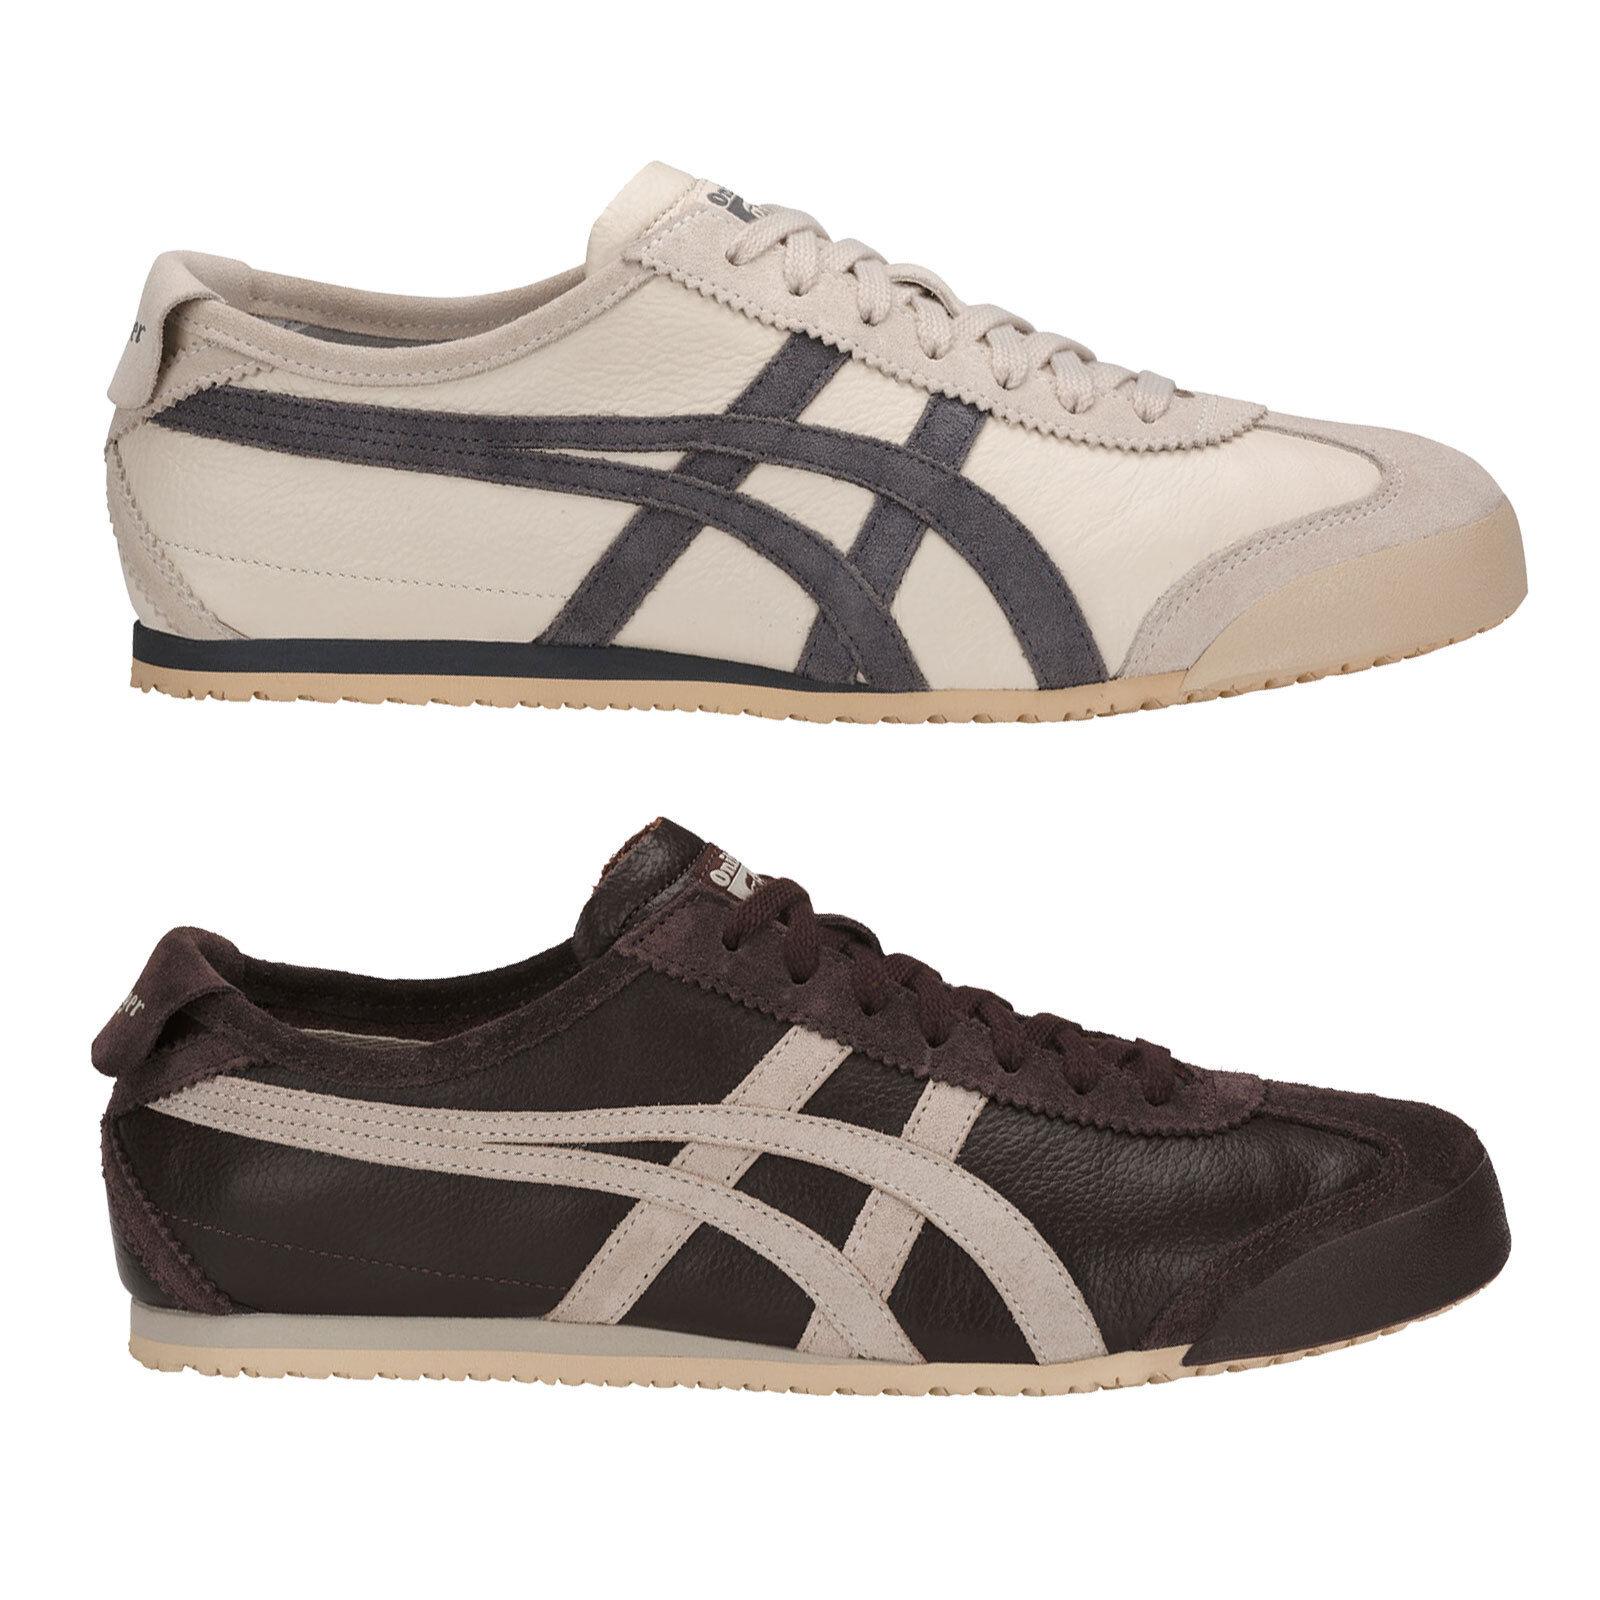 Onitsuka Tiger Mexico 66 Vin   Vintage Herren-Schuhe asics Turnschuhe Sneaker